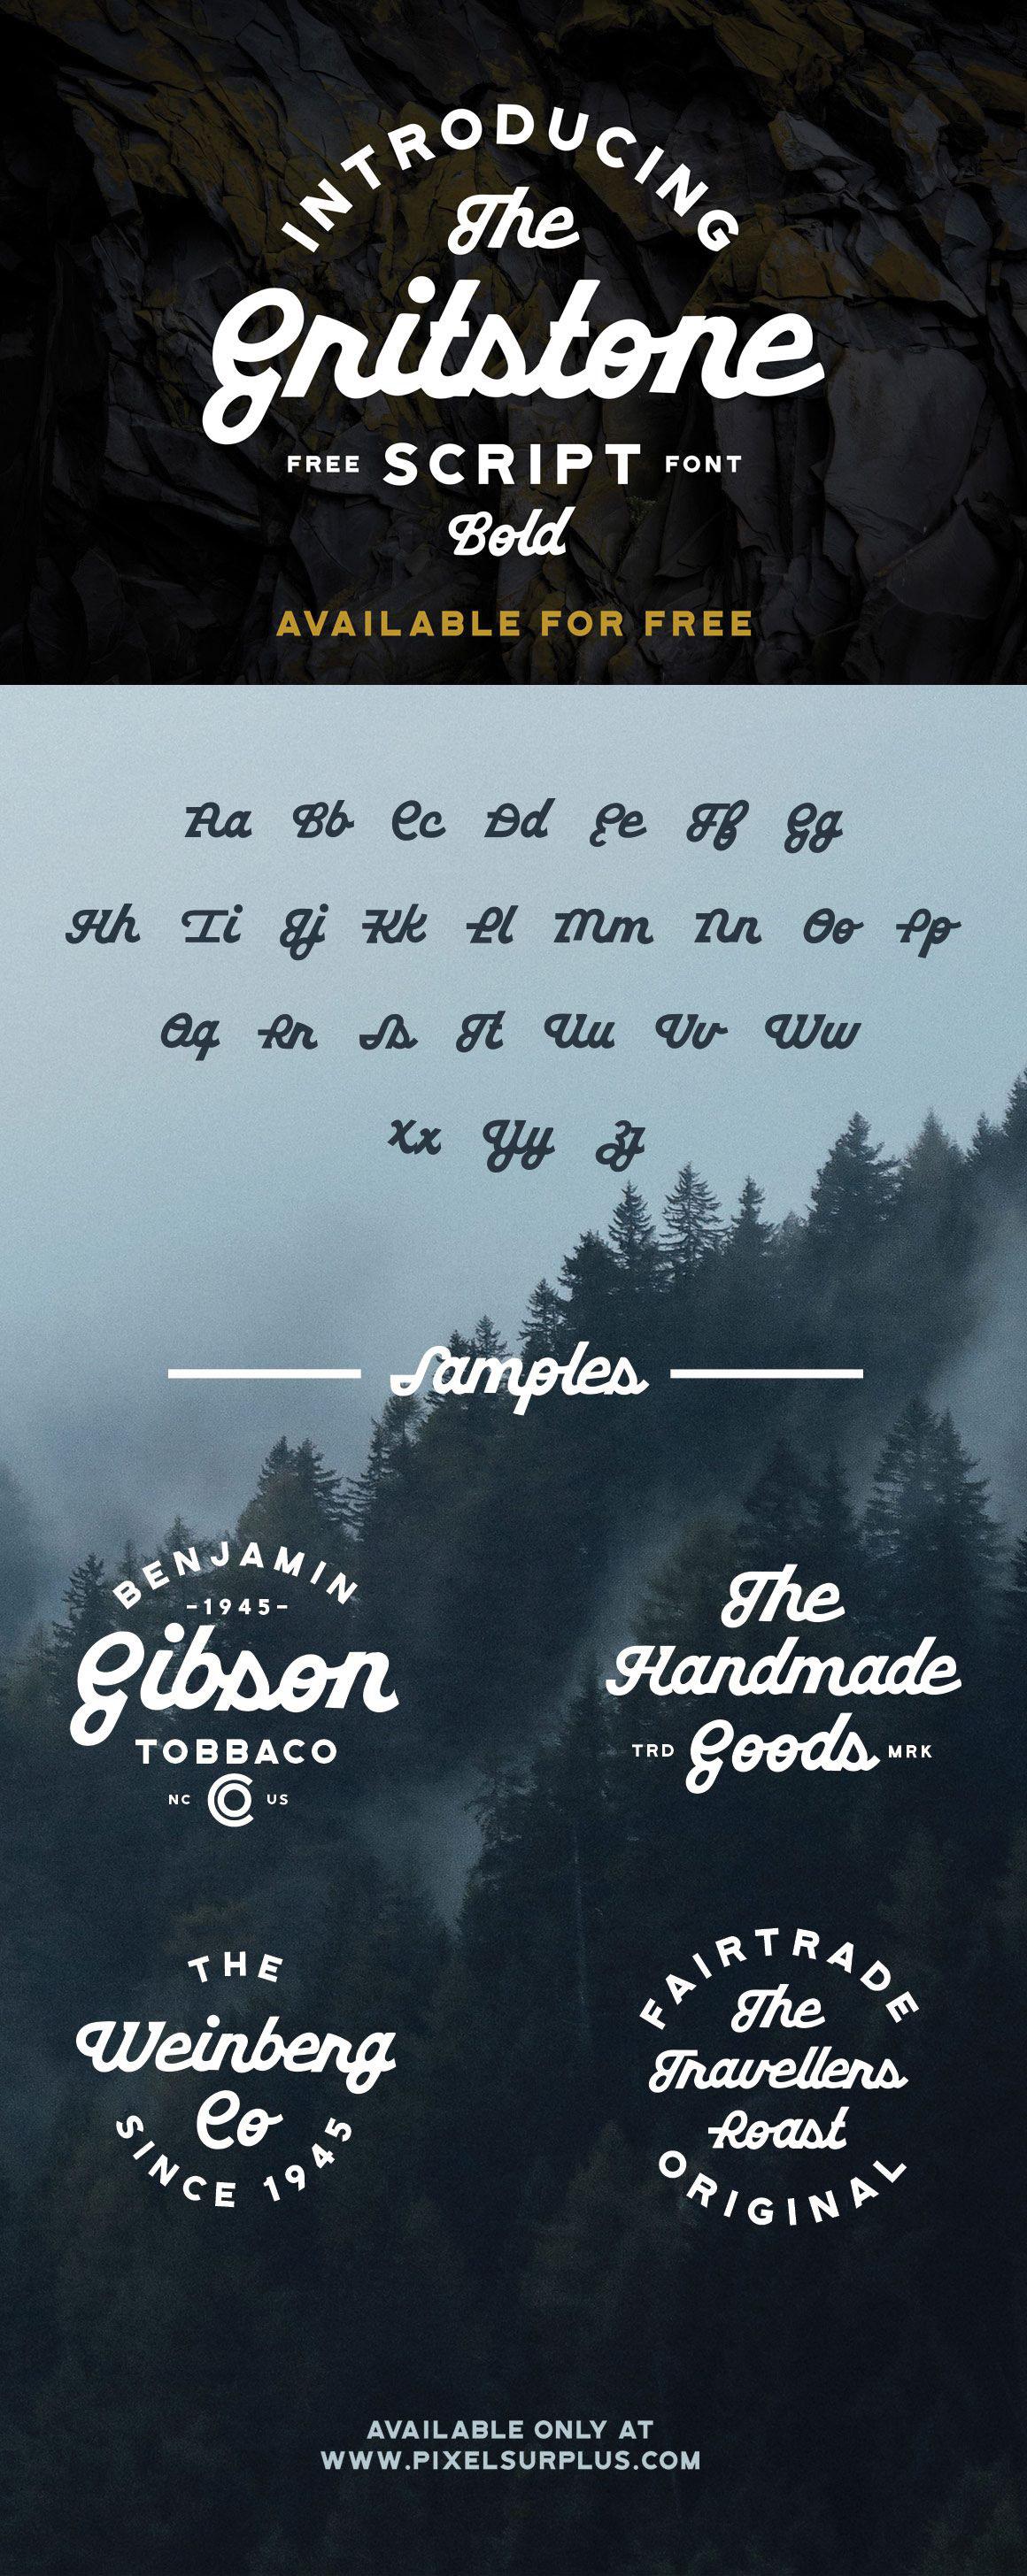 Free font free fonts freebie Script bold Typeface Display font free vintage